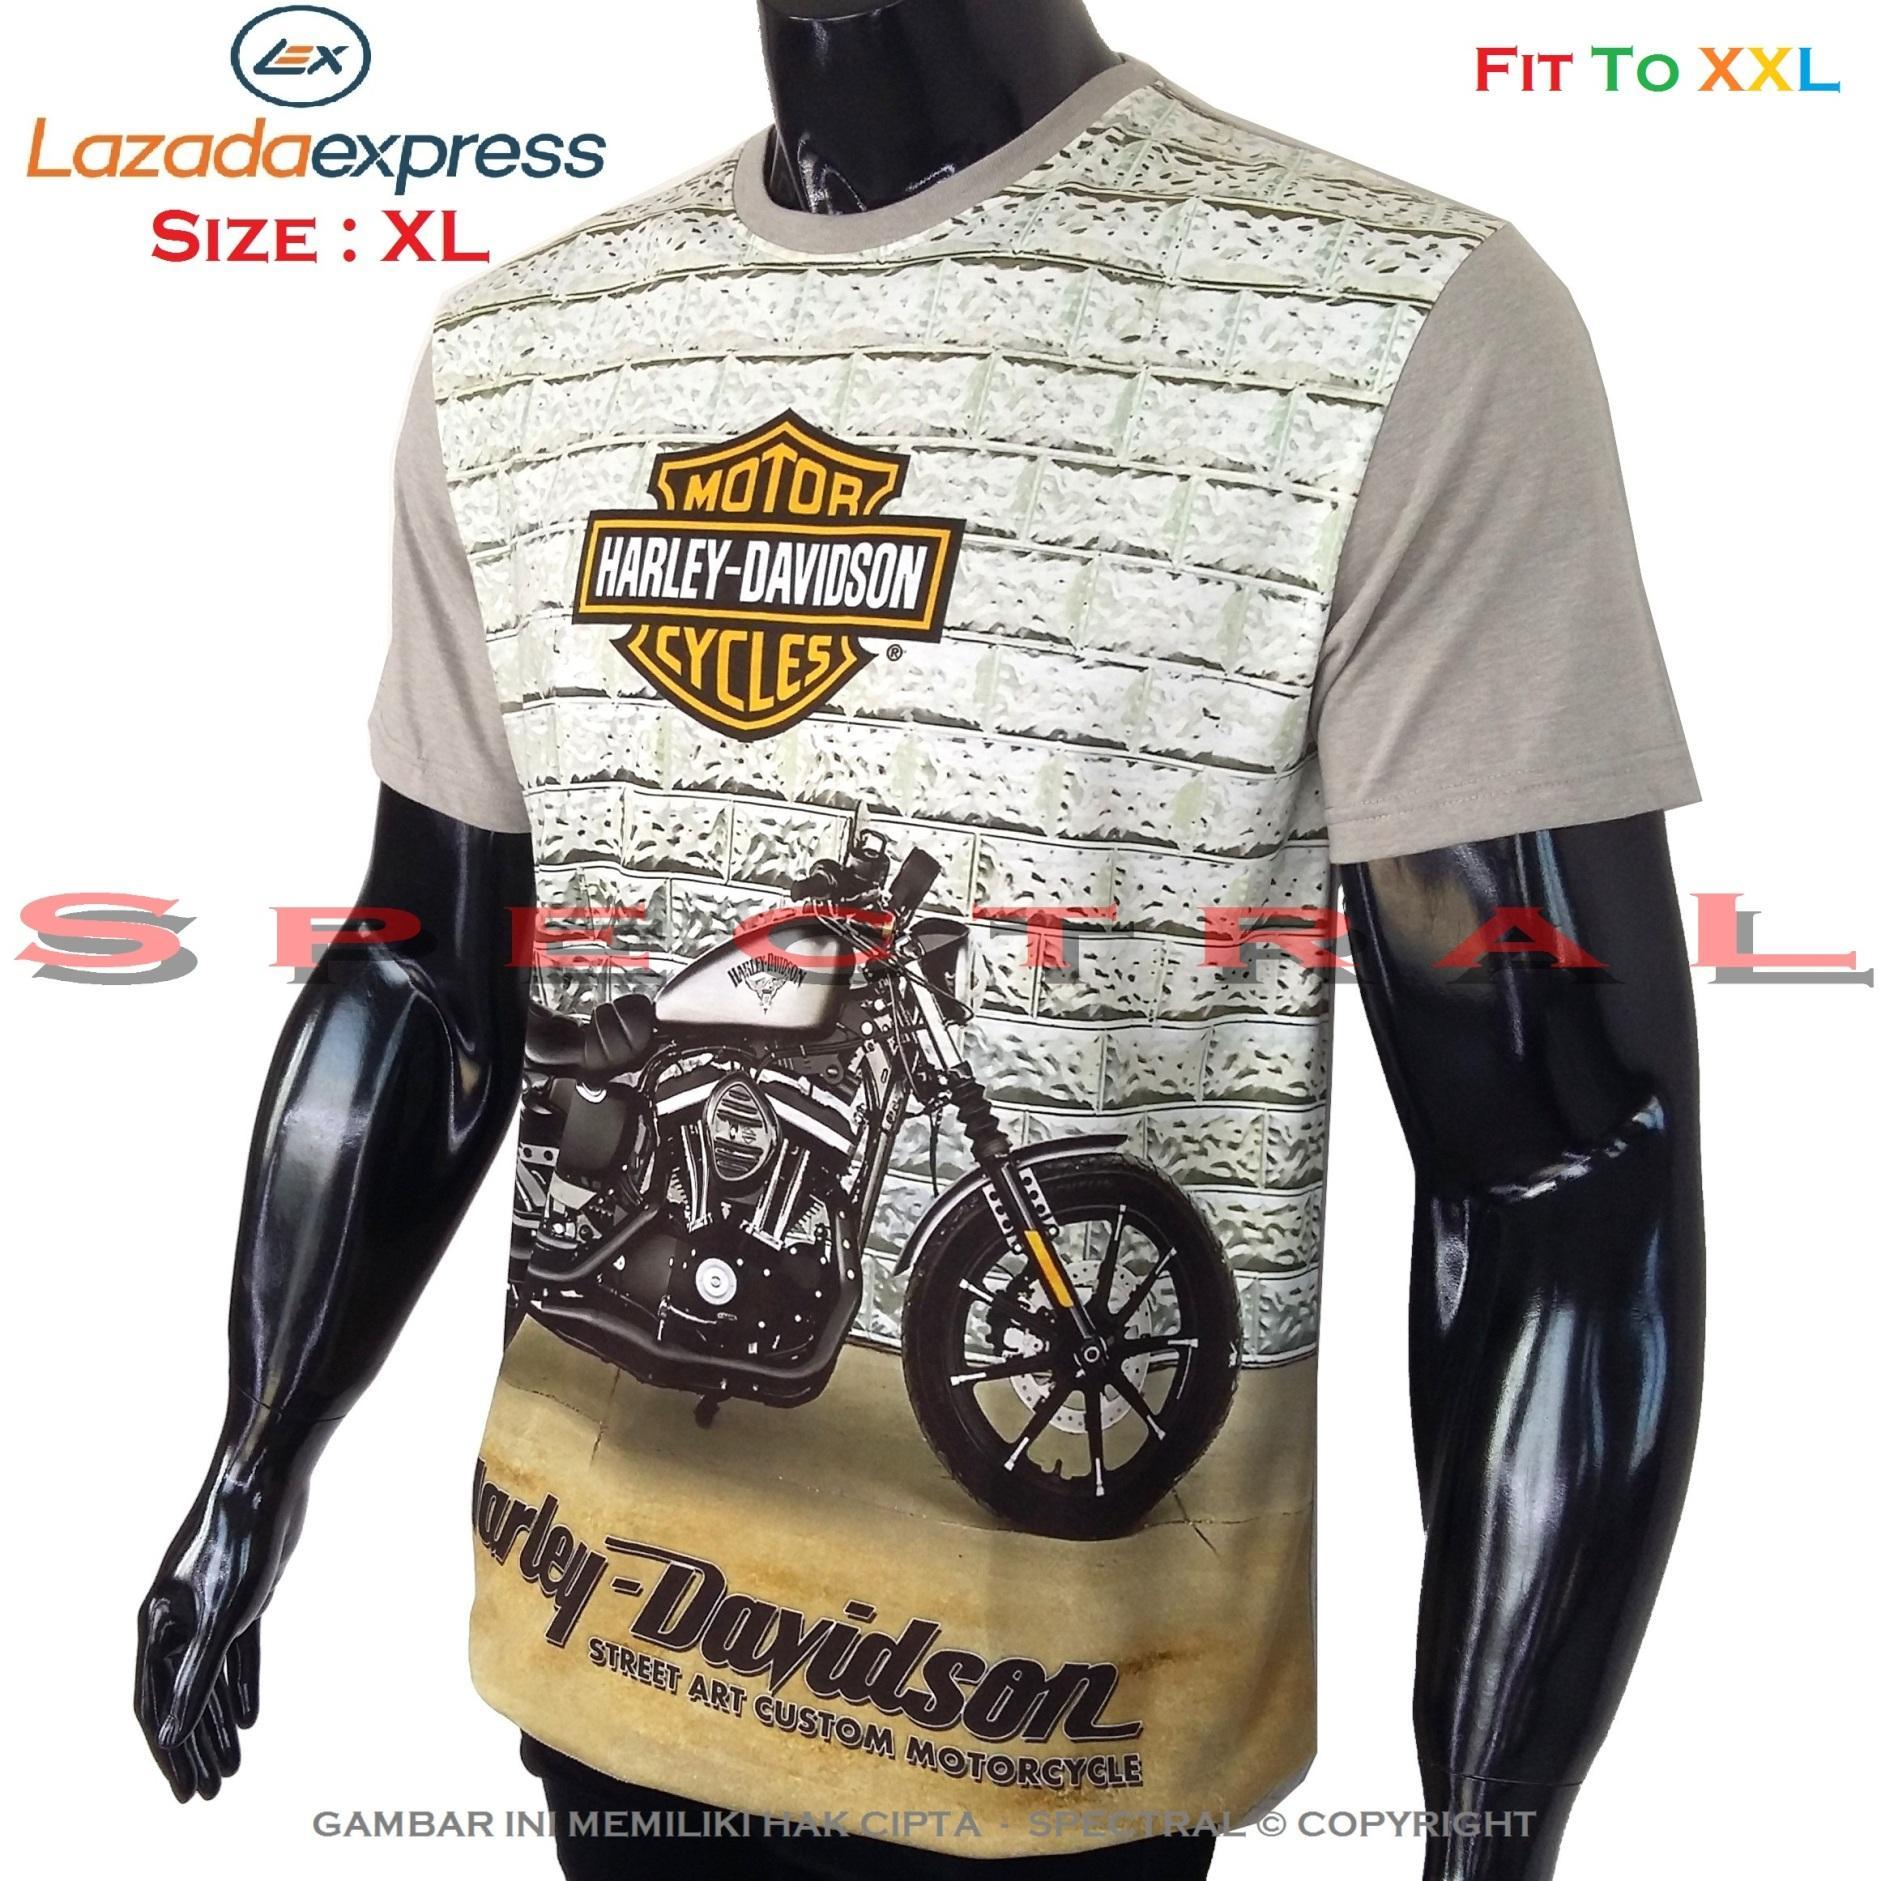 Spectral – 3D Harley Davidson Kualitas HD Printing Size XL Fit To XXL Soft Rayon Viscose Kaos Distro Fashion T-Shirt Atasan Oblong Baju Pakaian Polos Pria Wanita Cewe Cowo Lengan Murah Bagus Keren Jaman Kekinian Jakarta Bandung Gambar Mobil Motor Otomotif